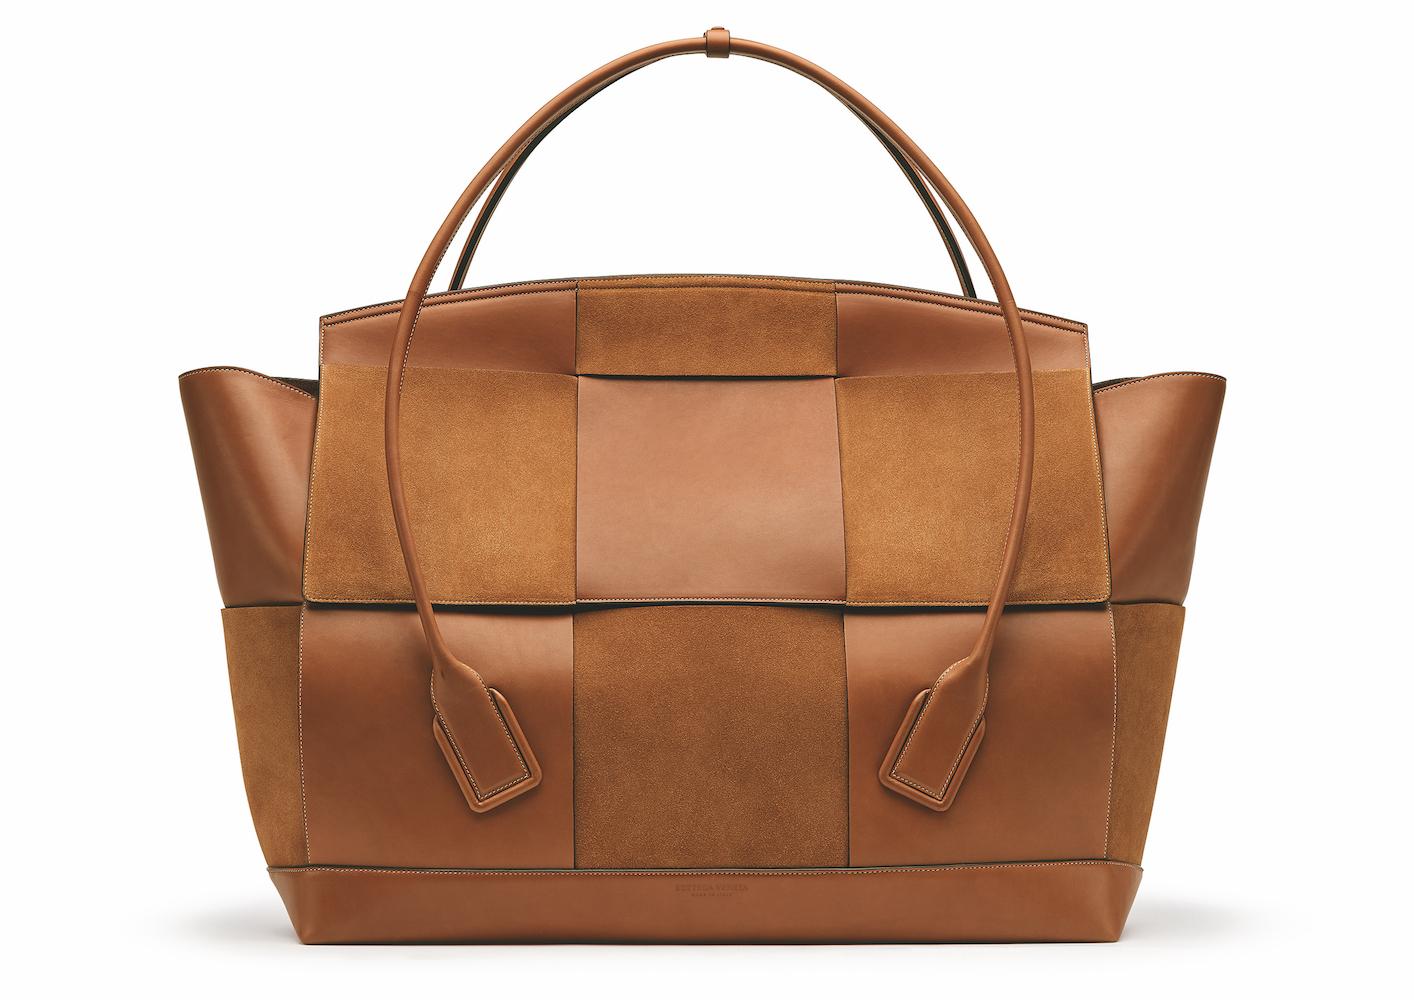 Bottega Veneta The Arco Bag (5).jpg